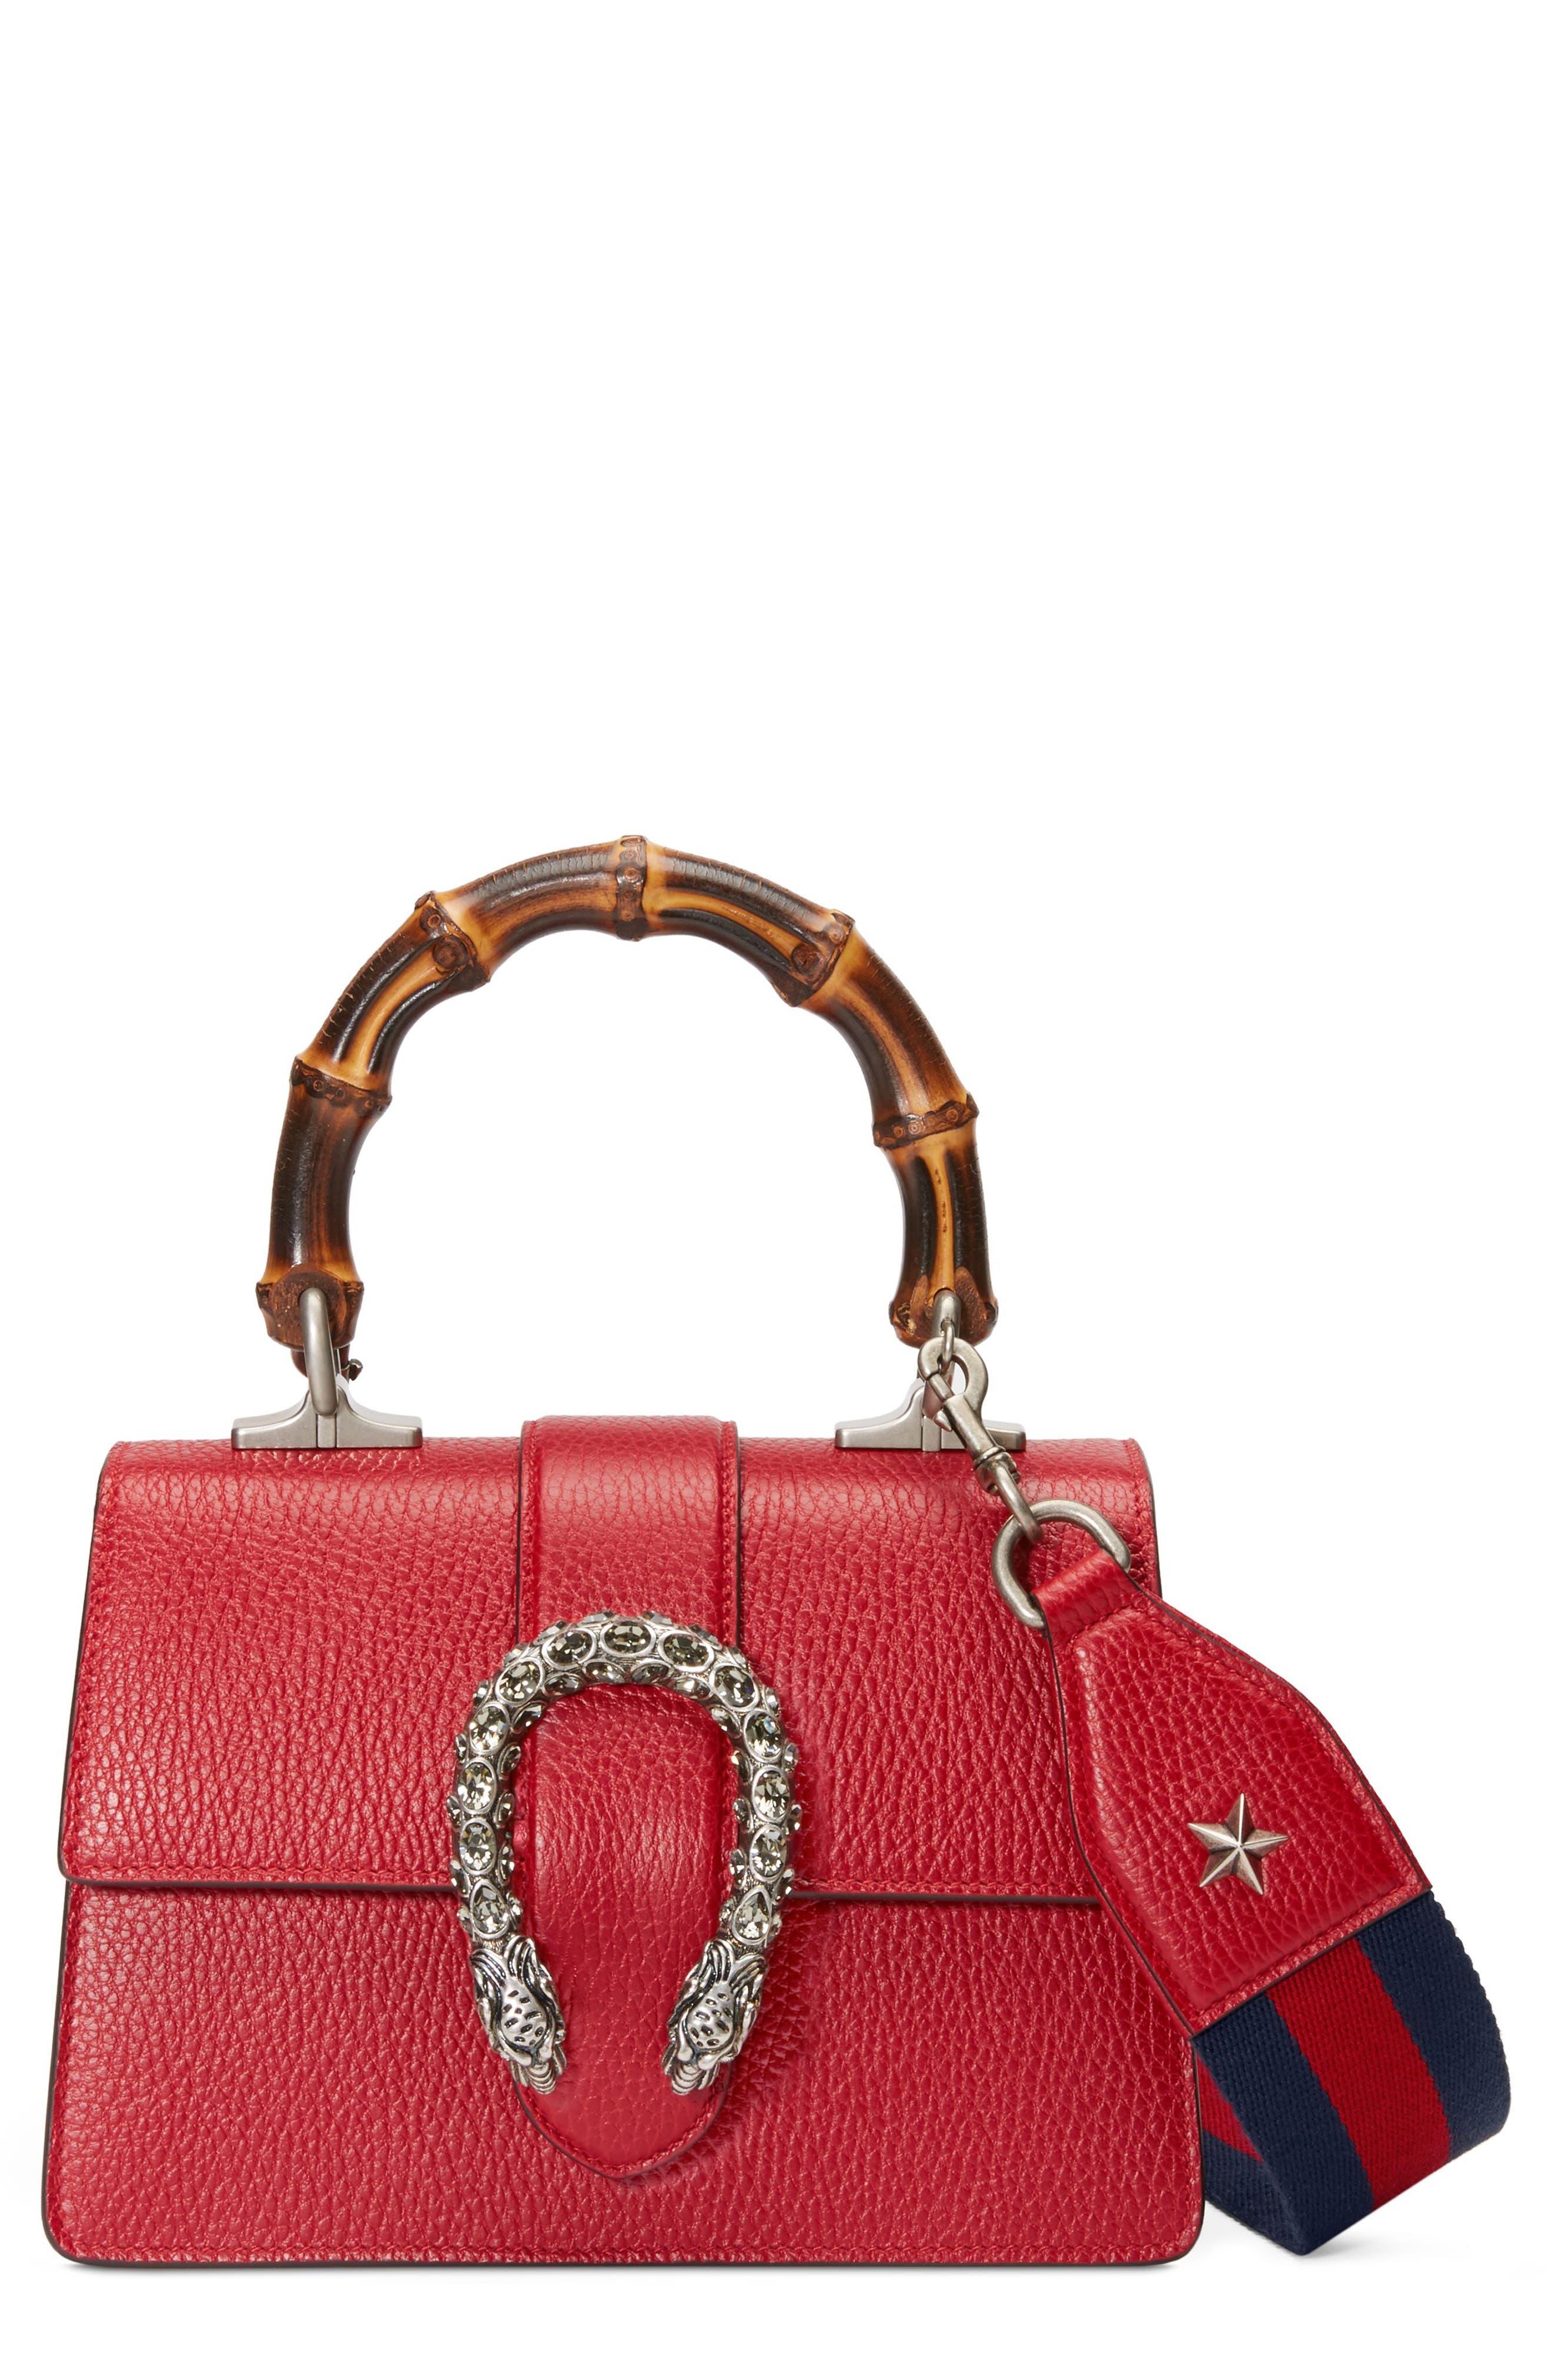 Mini Dionysus Leather Top Handle Satchel,                         Main,                         color, Red/ Blue/ Black Diamond